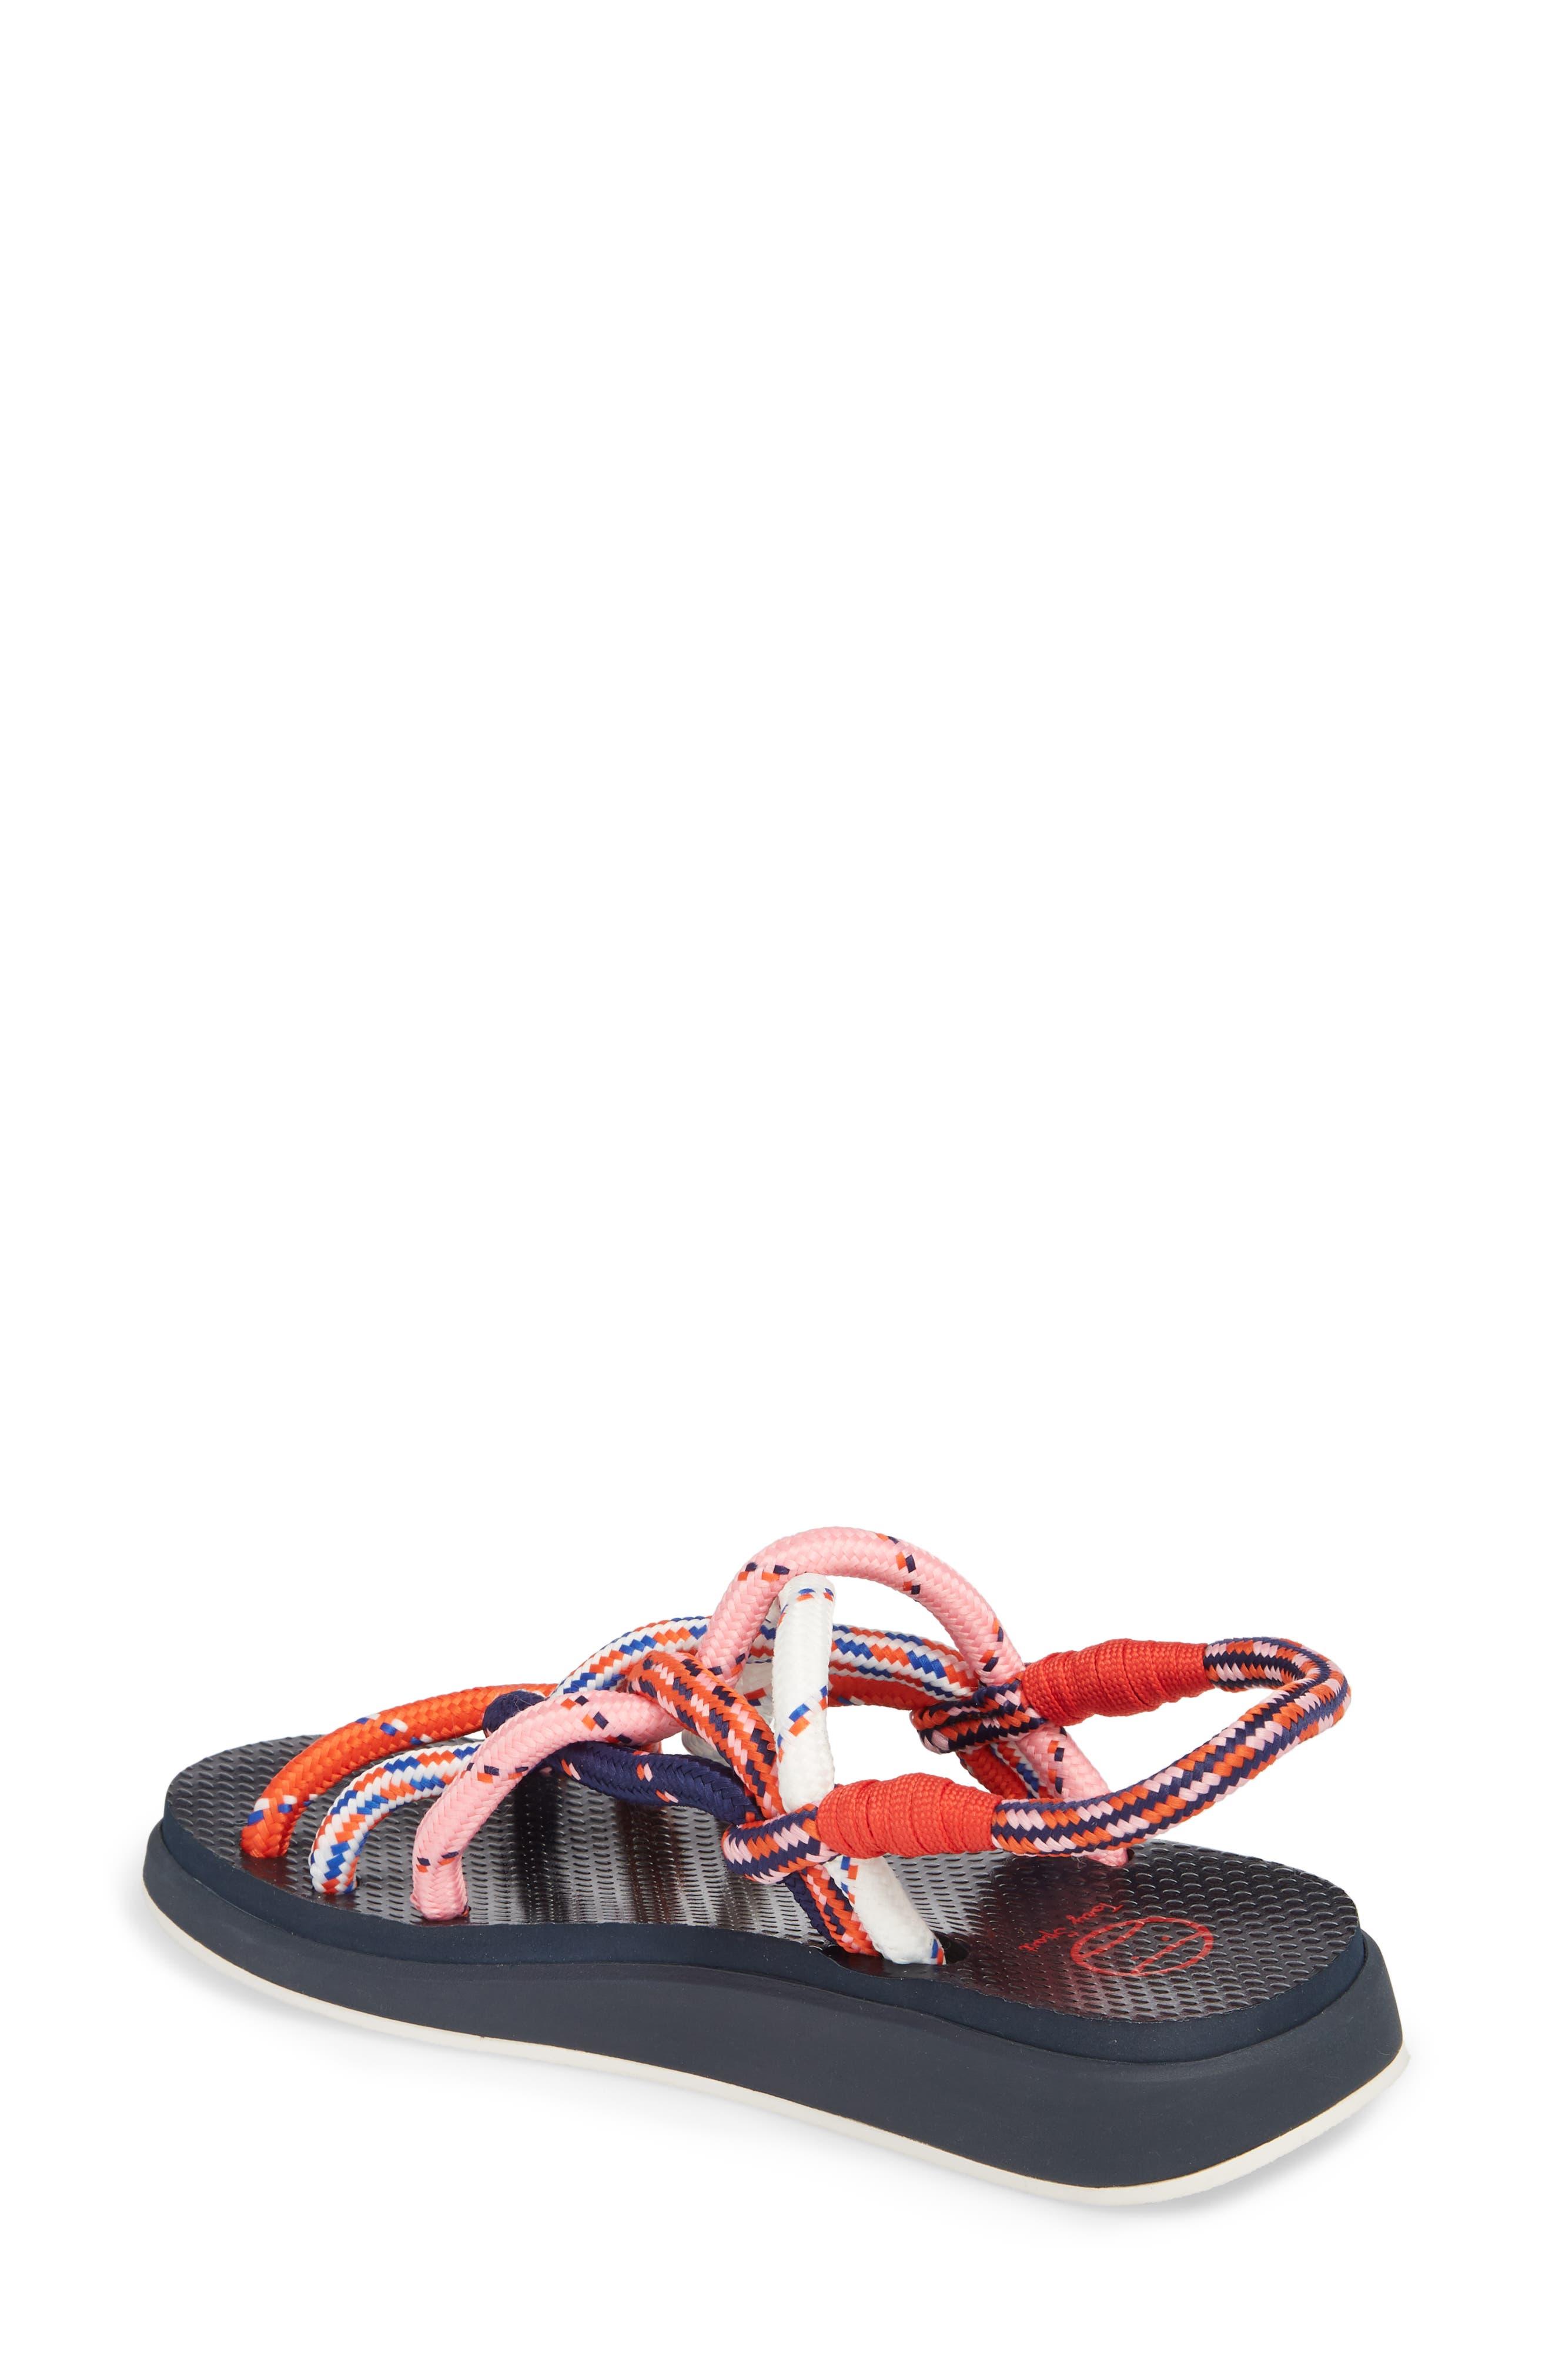 Rope Sandal,                             Alternate thumbnail 2, color,                             Red Multi